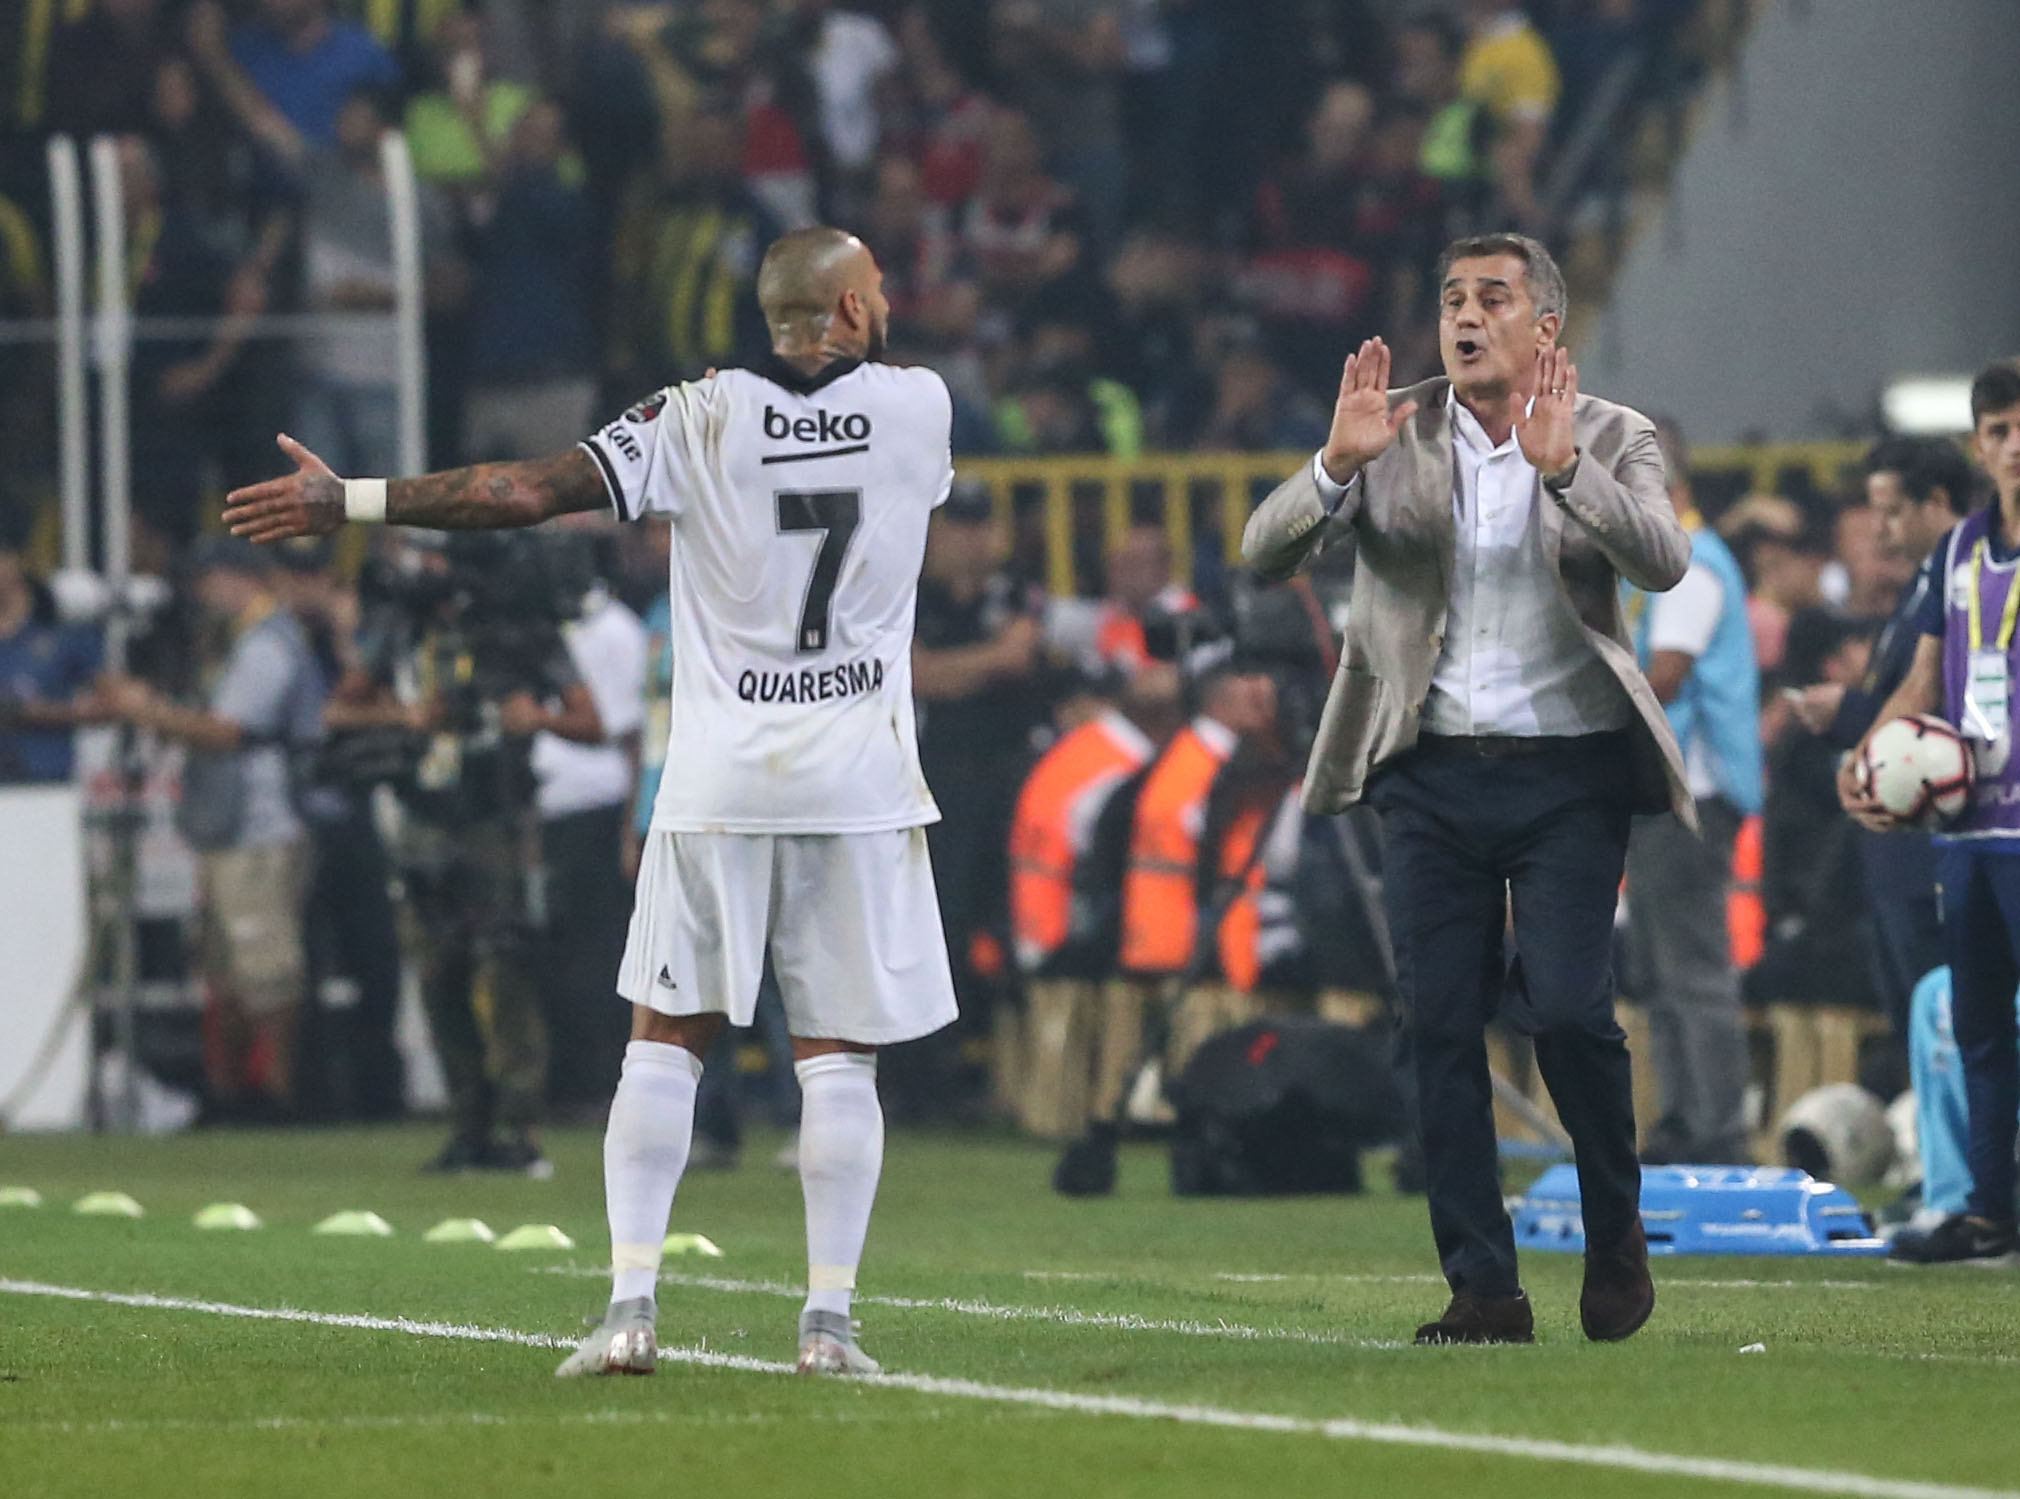 Ricardo Quaresma Senol Gunes Fenerbahce Besiktas Super Lig 09/24/18